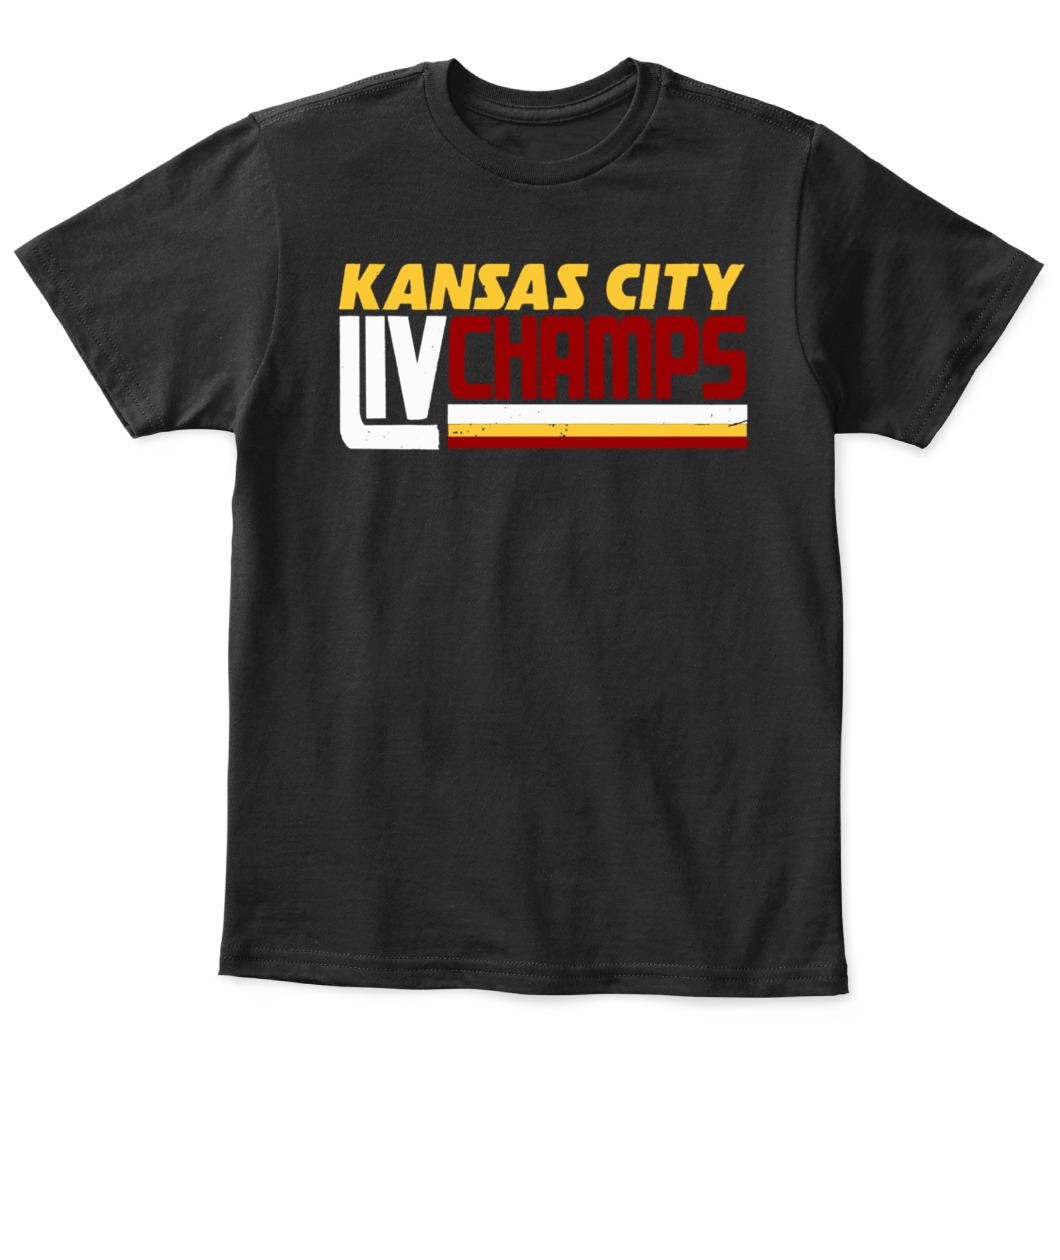 Happy St Chiefs Champs Unisex Shirt Patricks Mahomes Kansas City